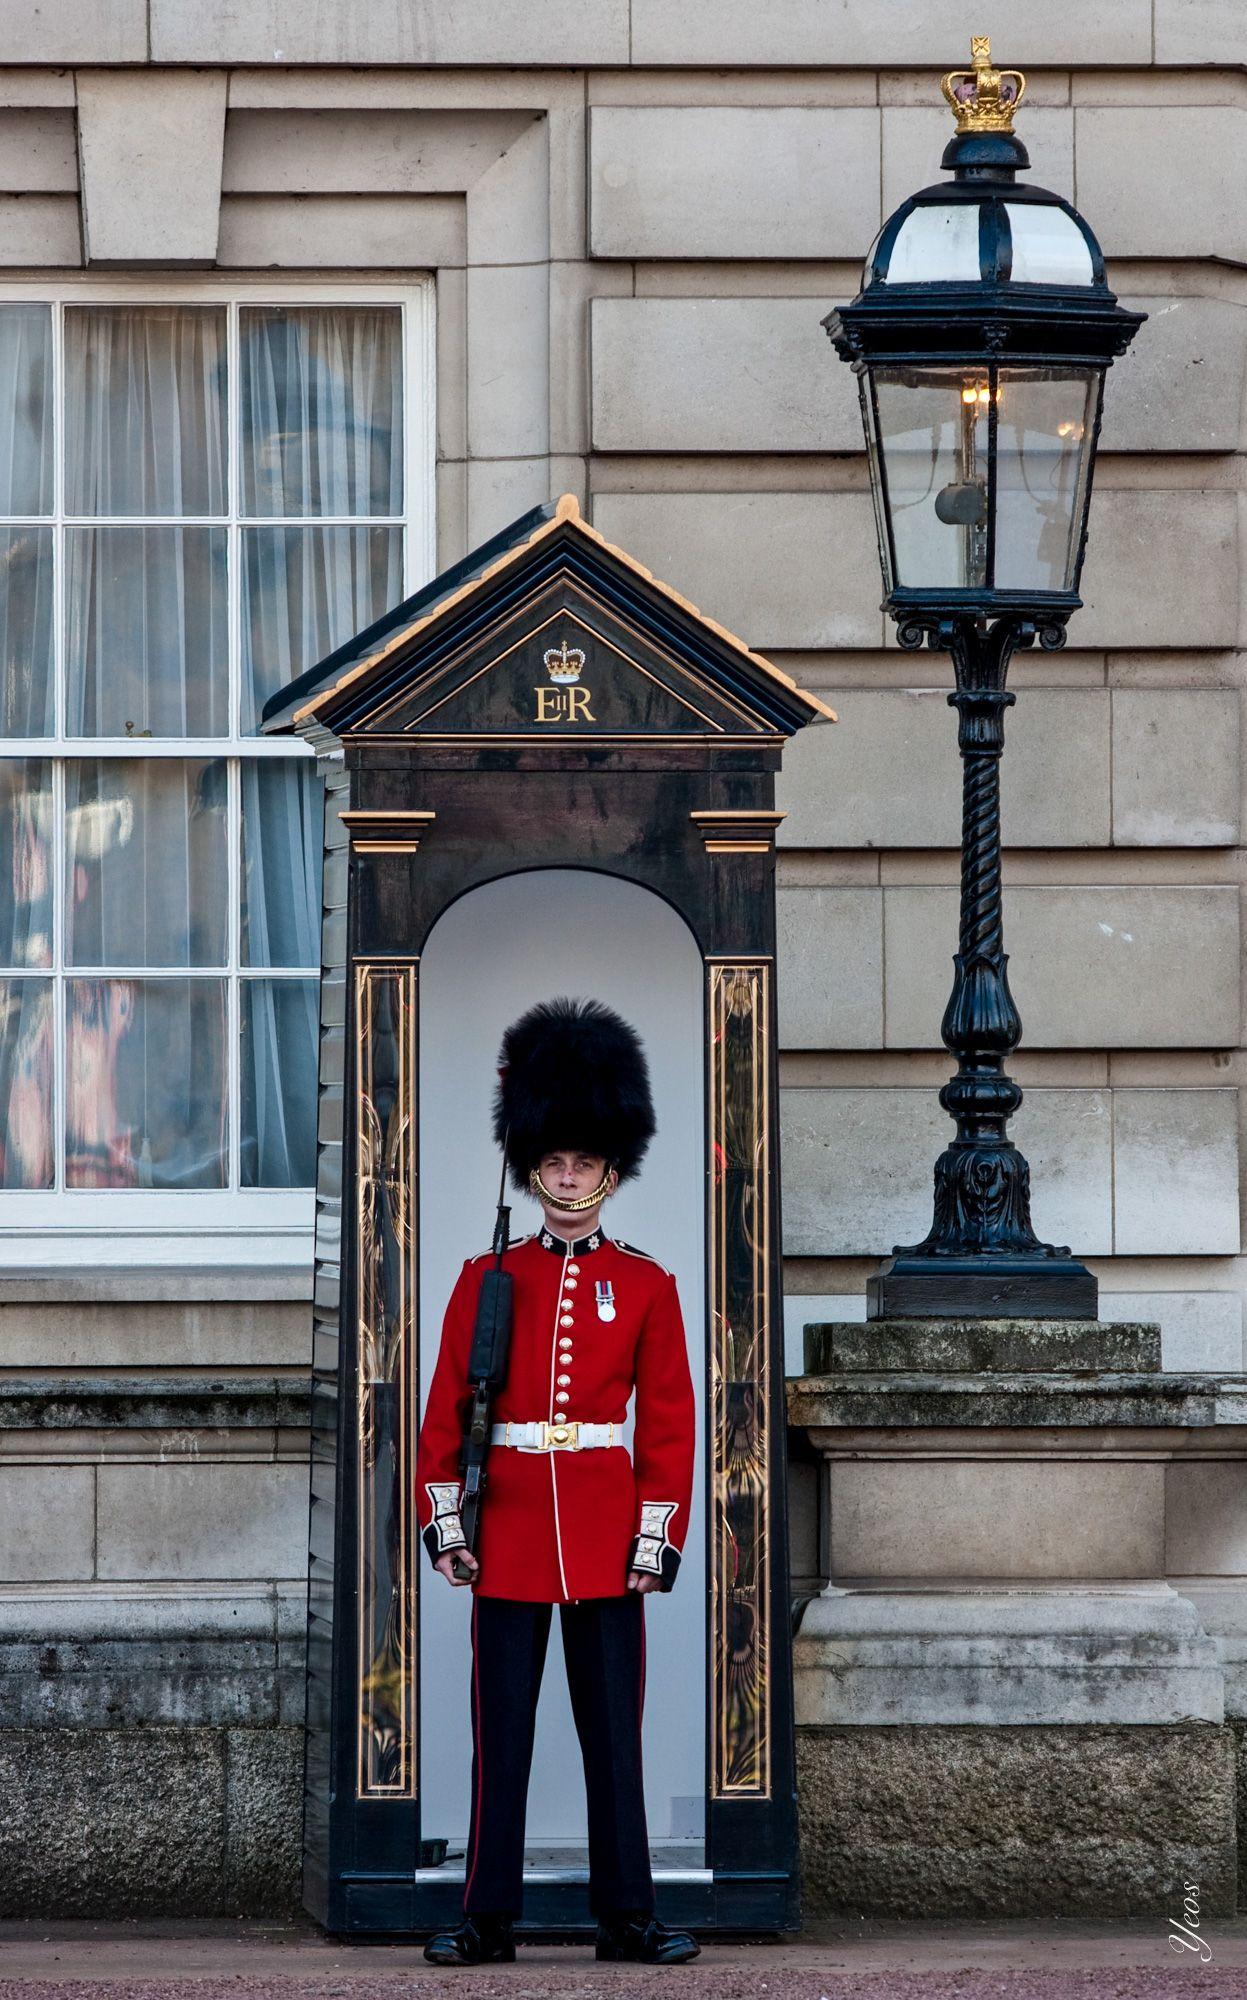 London Buckingham palace, Londen, Engeland